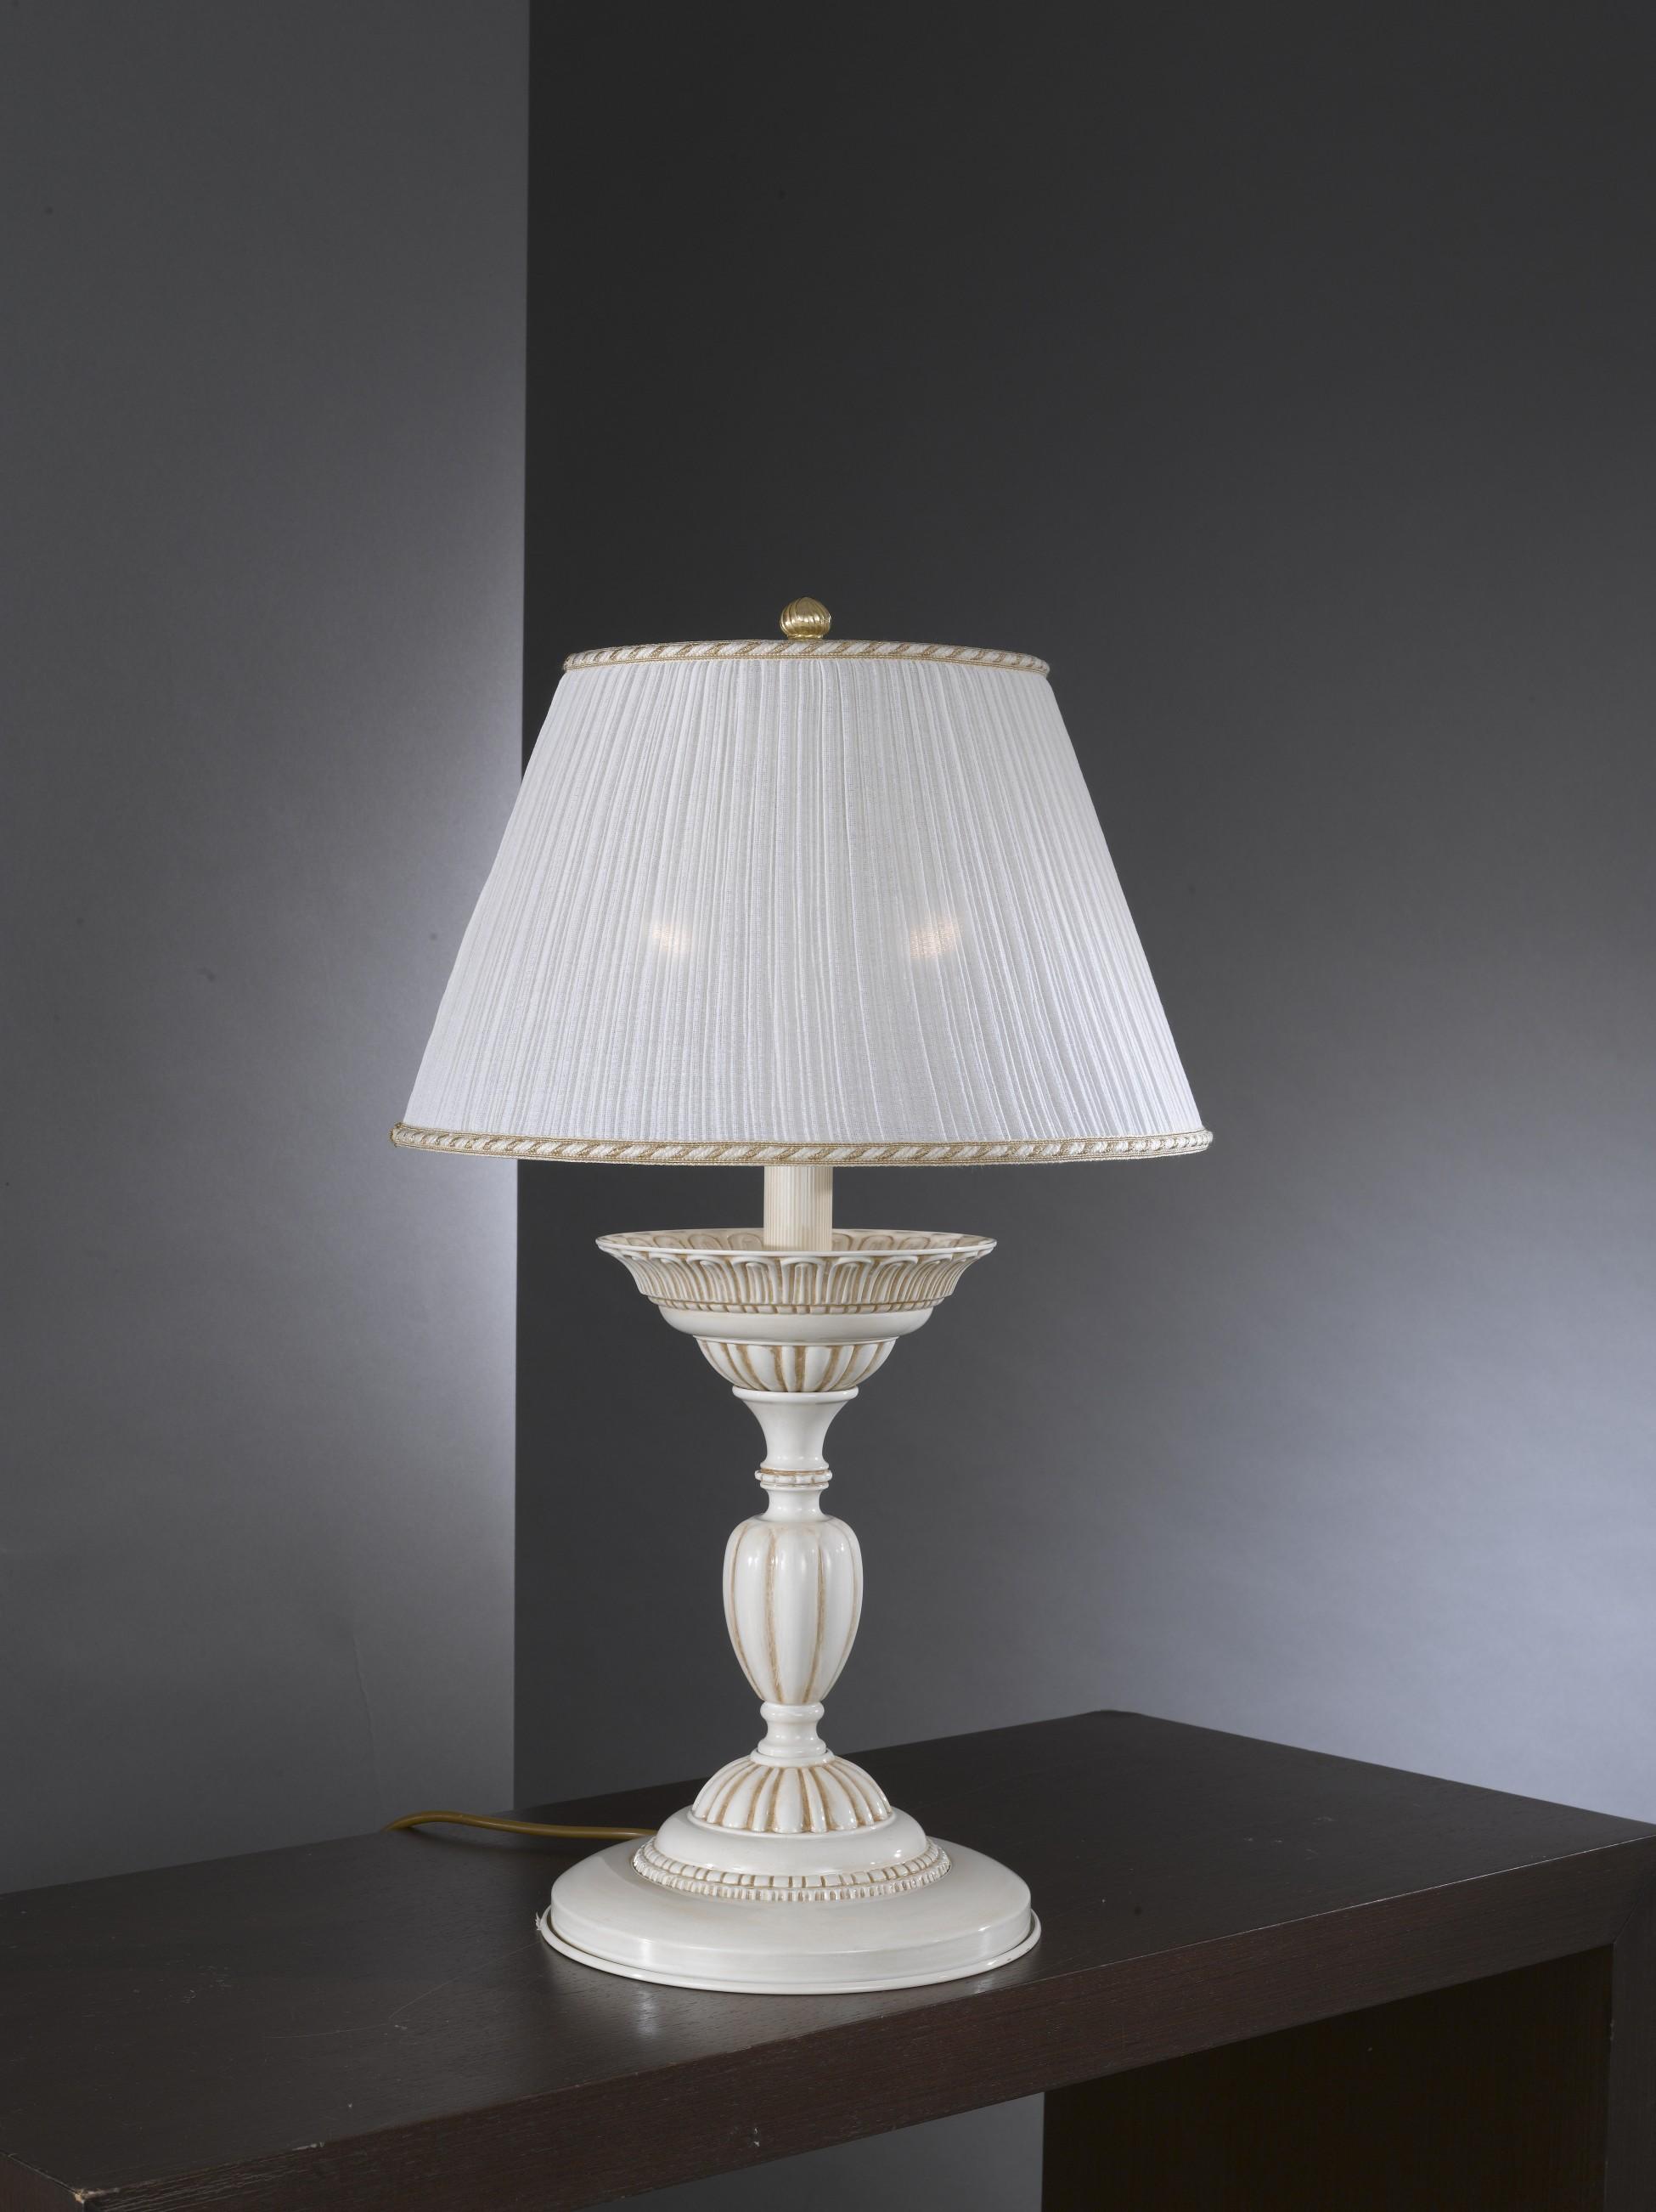 Lampenschirm Fur Stehlampe Antik لم يسبق له مثيل الصور Tier3 Xyz